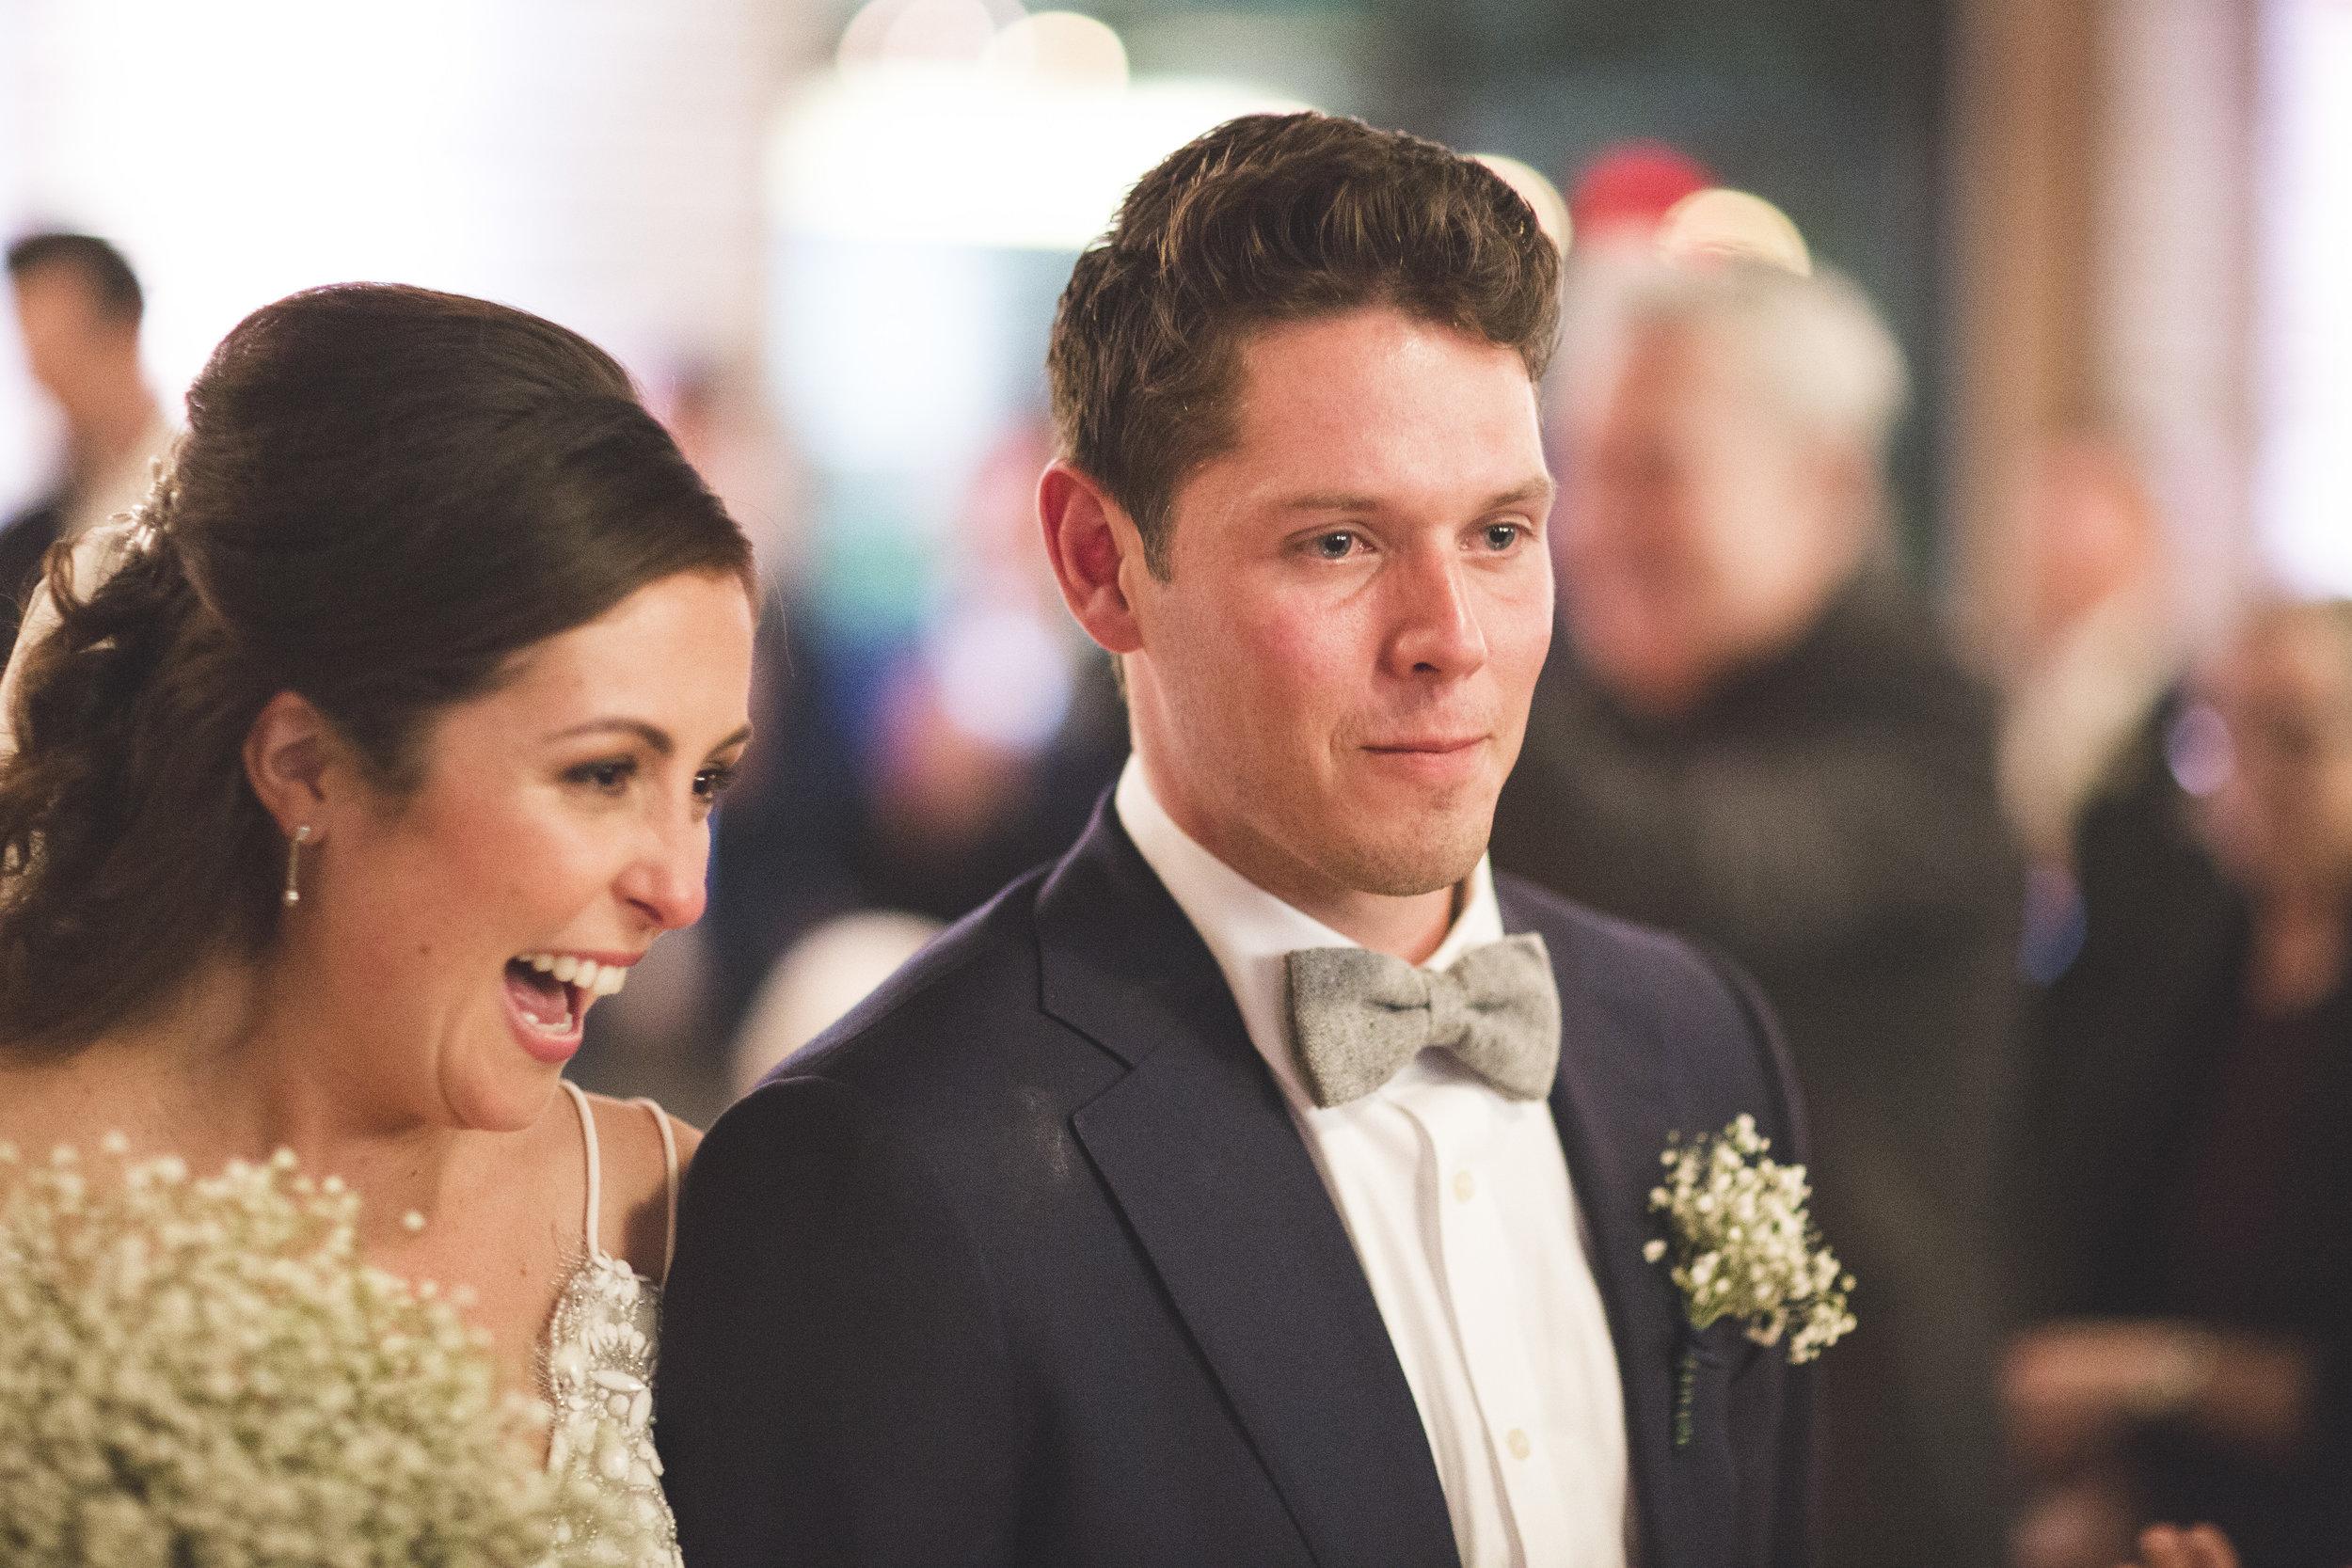 Emotional groom walking back down the aisle at wedding.